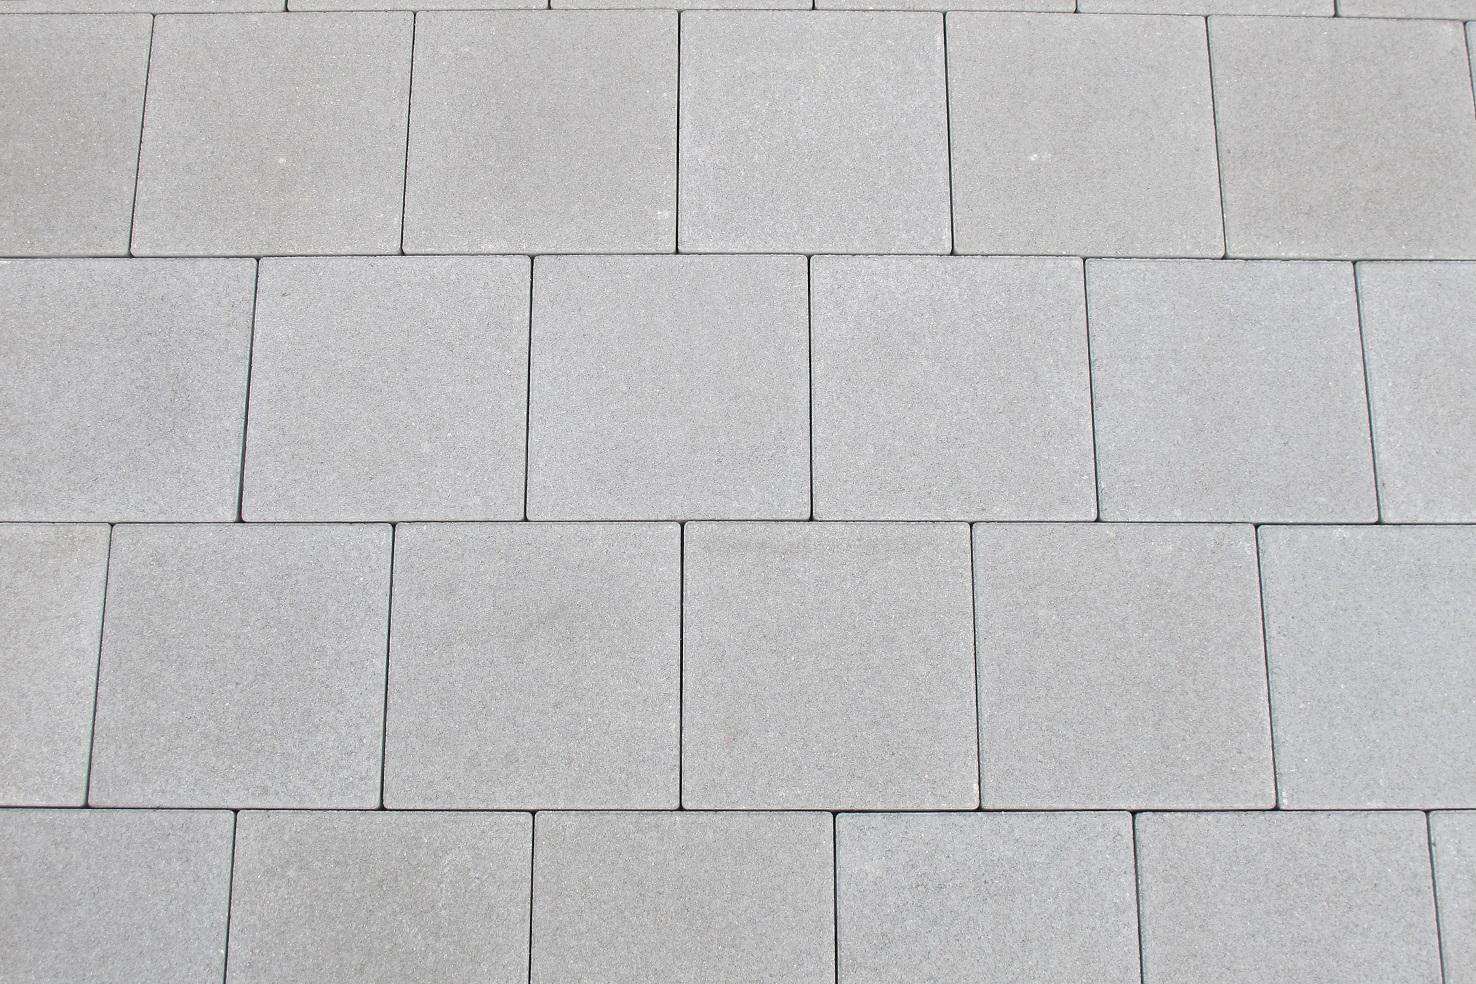 Terrassenplatten Hellgrau Dauerhaft Imprägniert